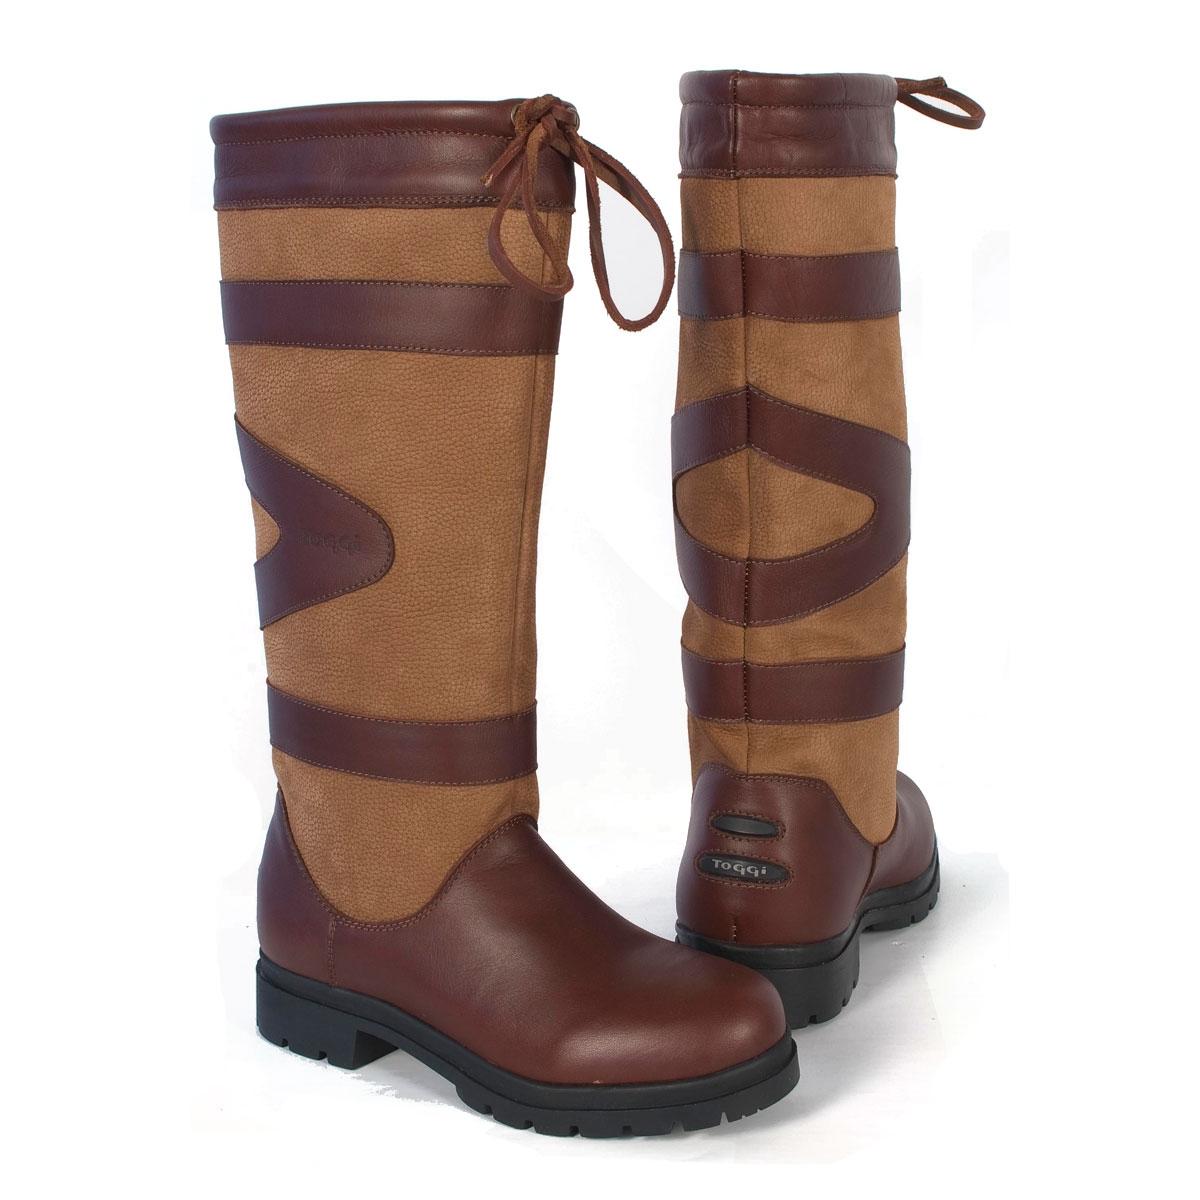 Toggi Berkeley Country Boot (Unisex) -  Warm  Intellectuality